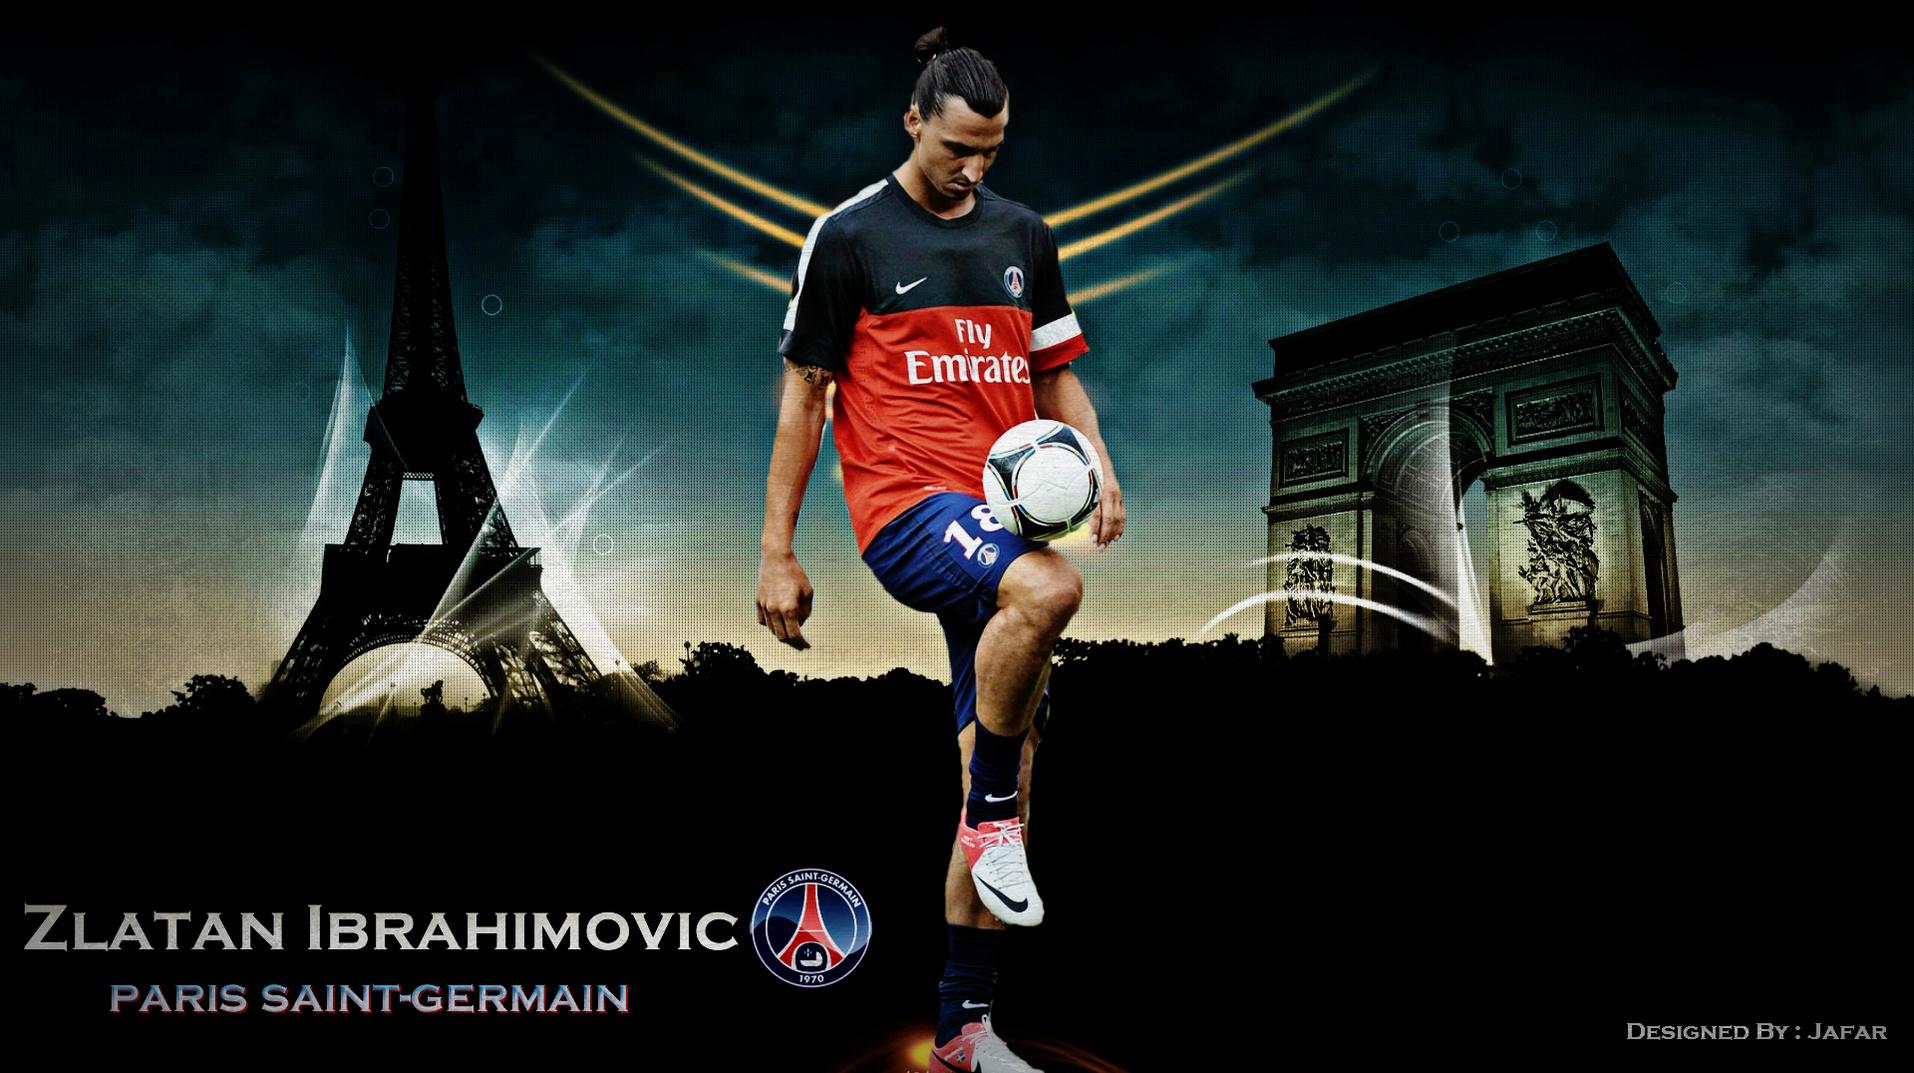 Zlatan Ibrahimovic PSG Exclusive HD Wallpapers 1143 1914x1073